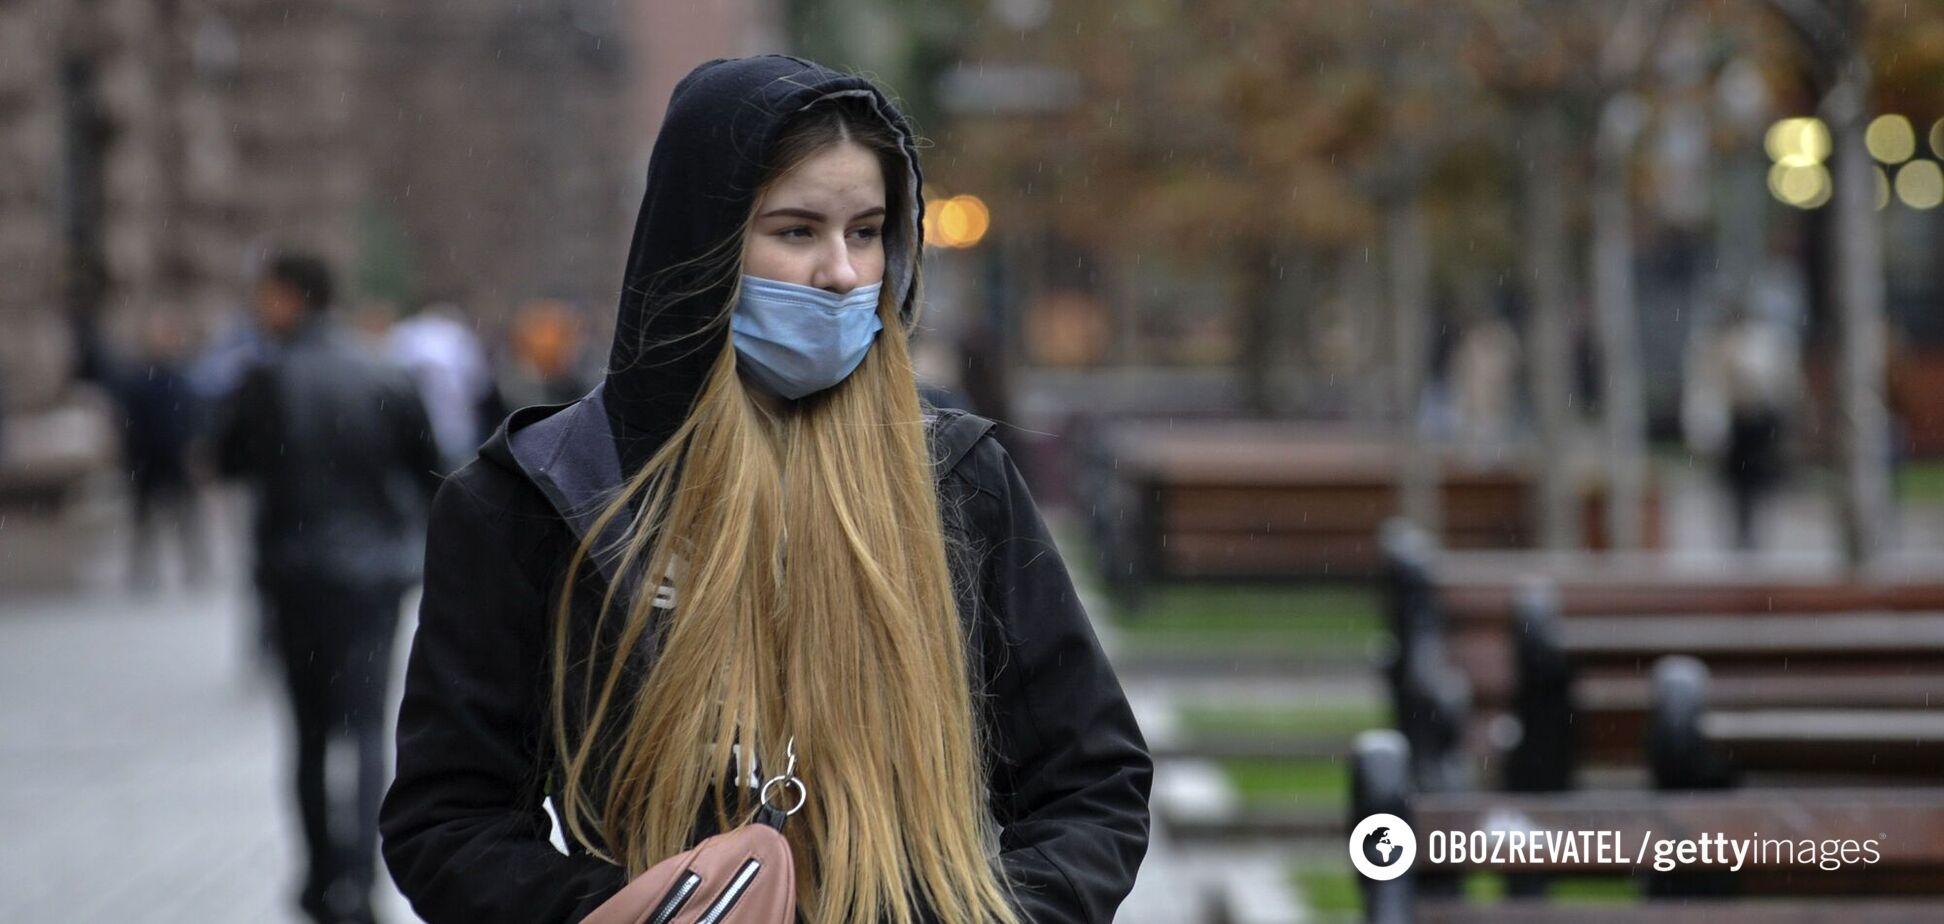 В Киеве ухудшилась ситуация с COVID-19: школы уйдут на каникулы раньше